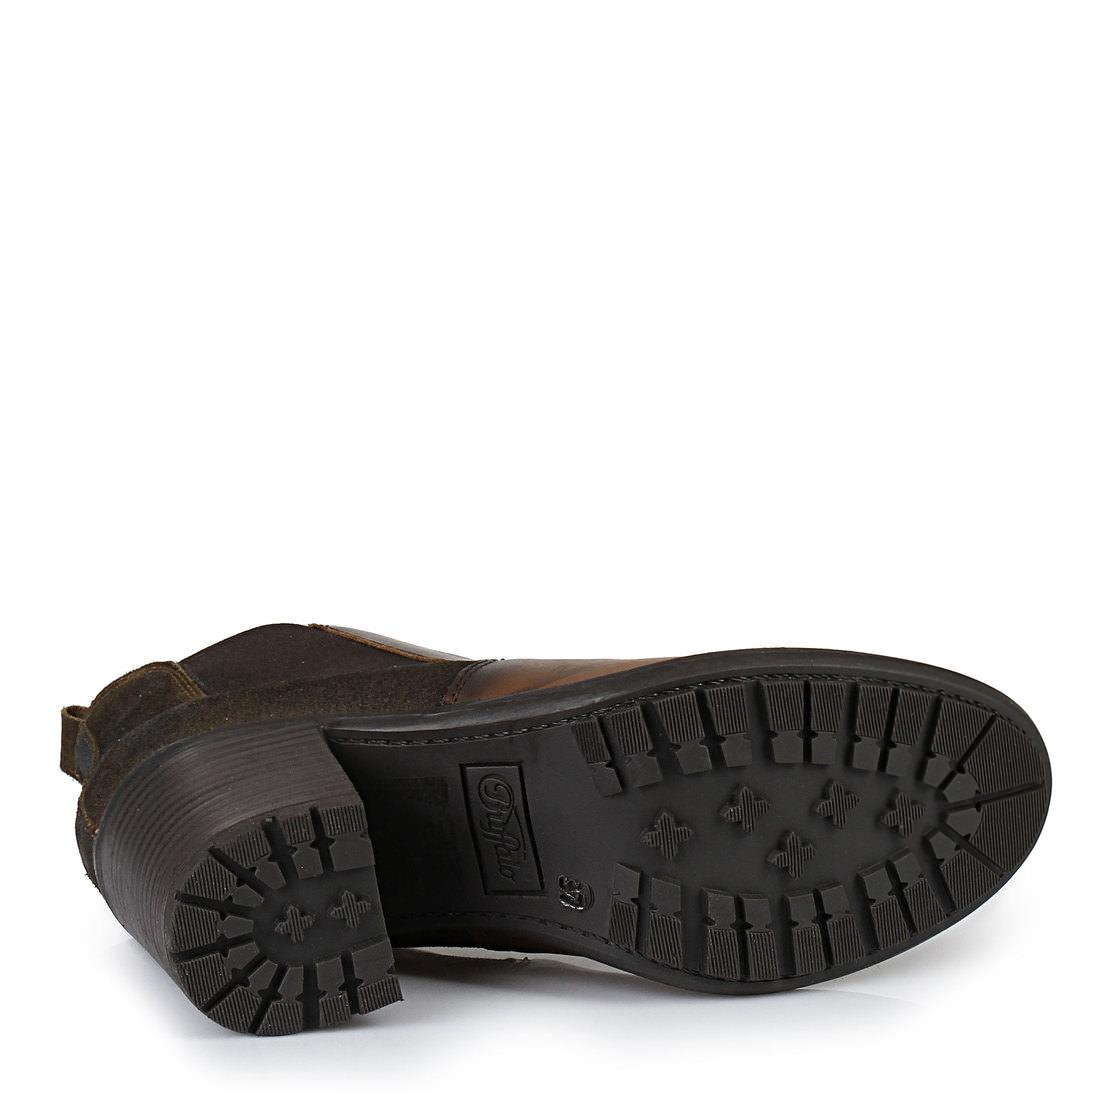 Buffalo ankle boots in brown buy online in BUFFALO Online-Shop ...